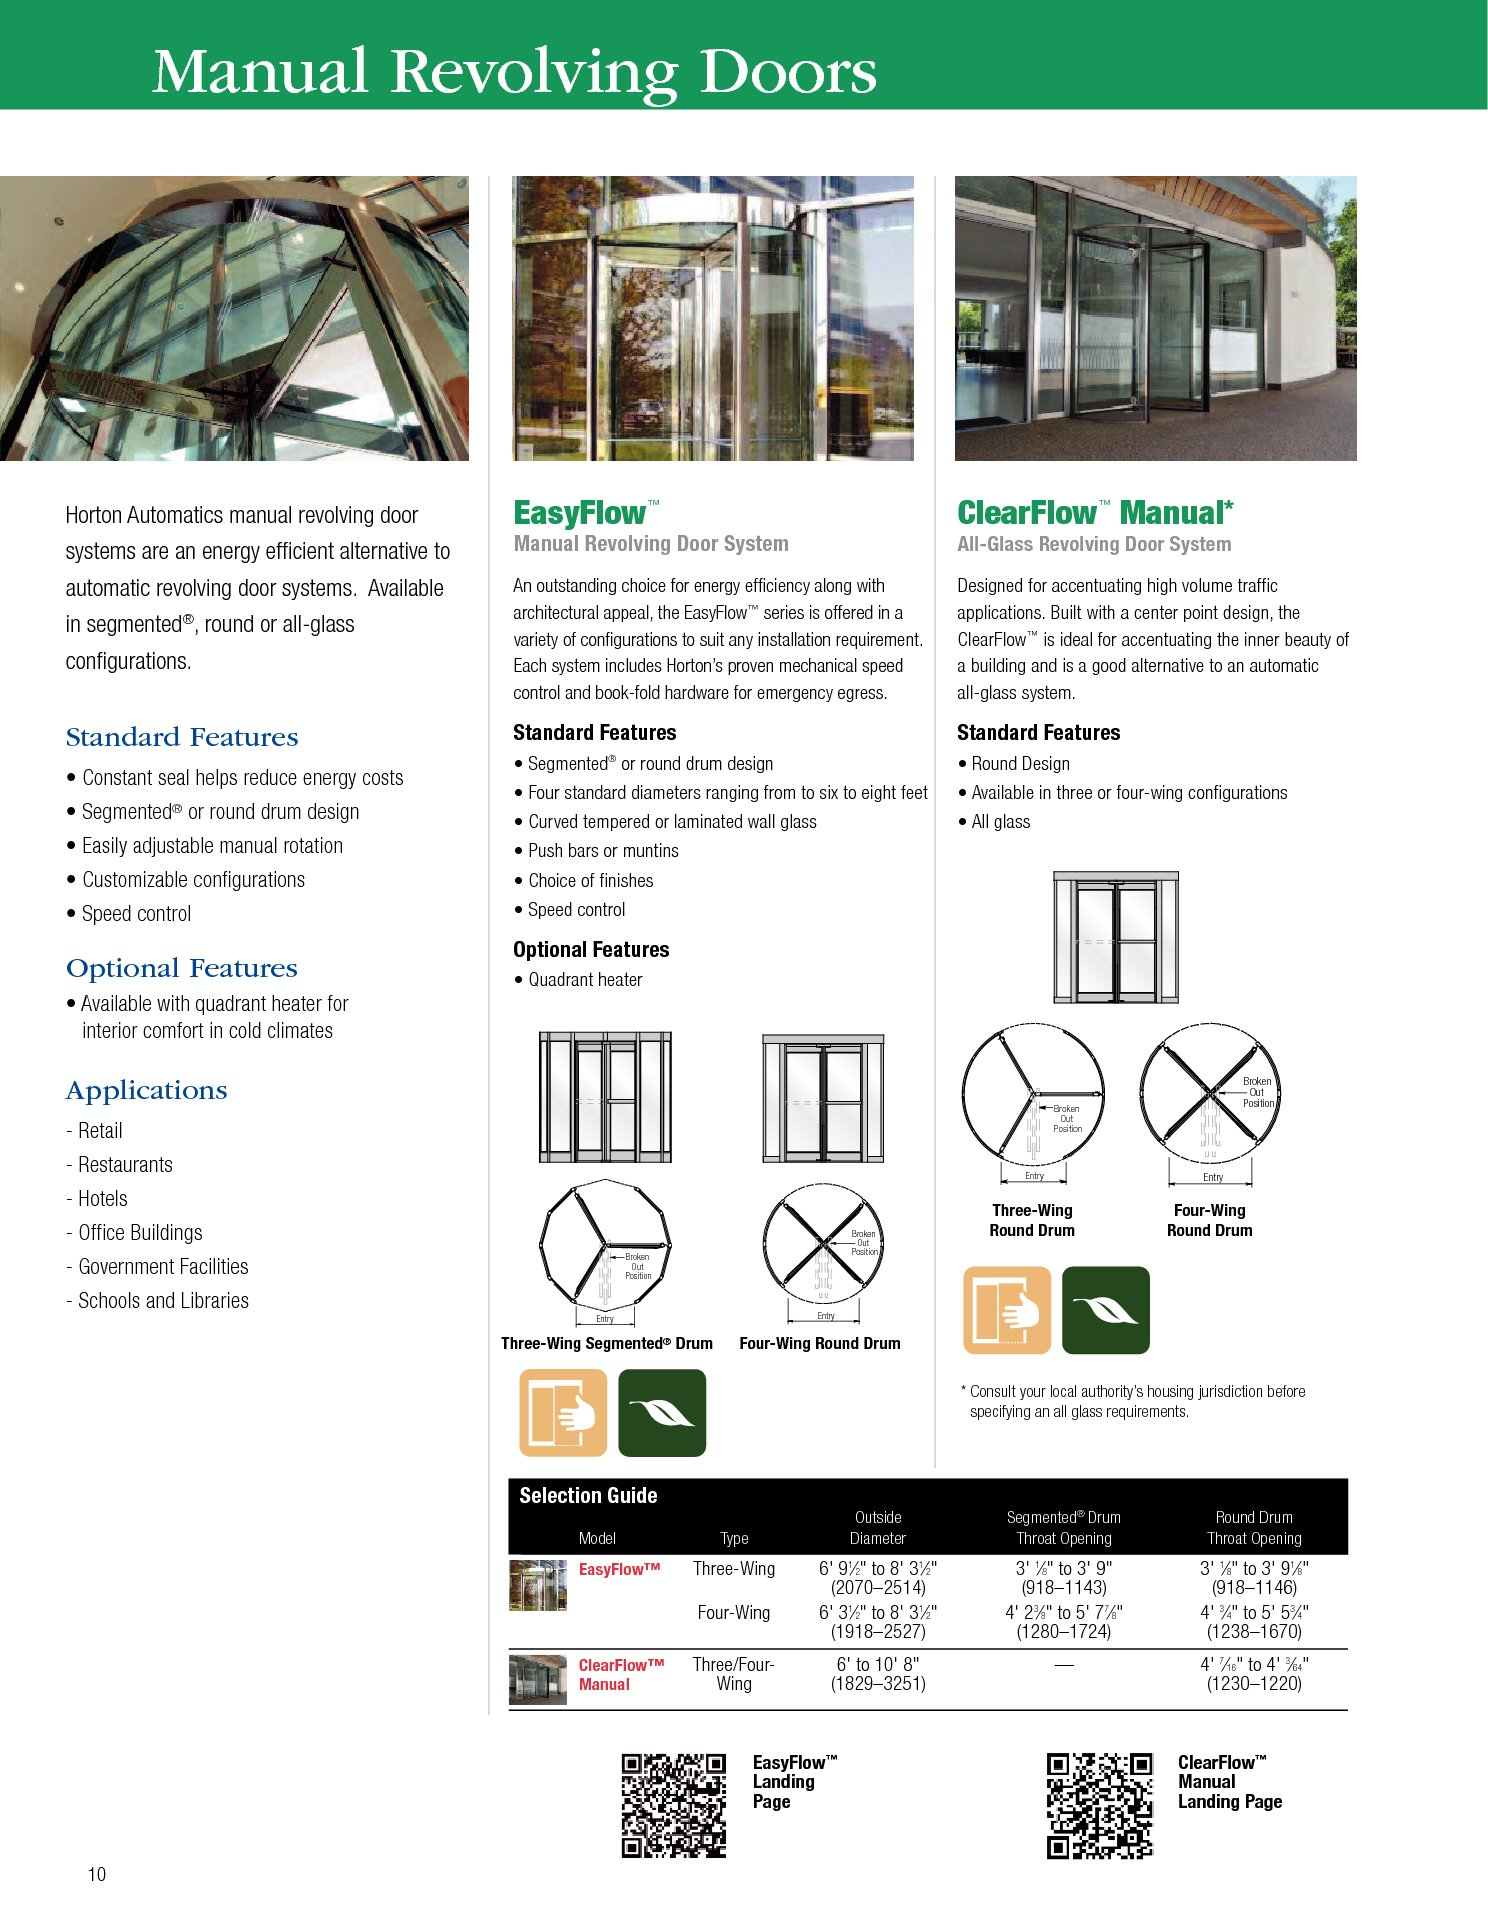 Horton Revolving Door Instruction Manual Countax E36 Wiring Diagram Dorma Array Click This Link For U0027s Brochure Rh Heinzeroth Com